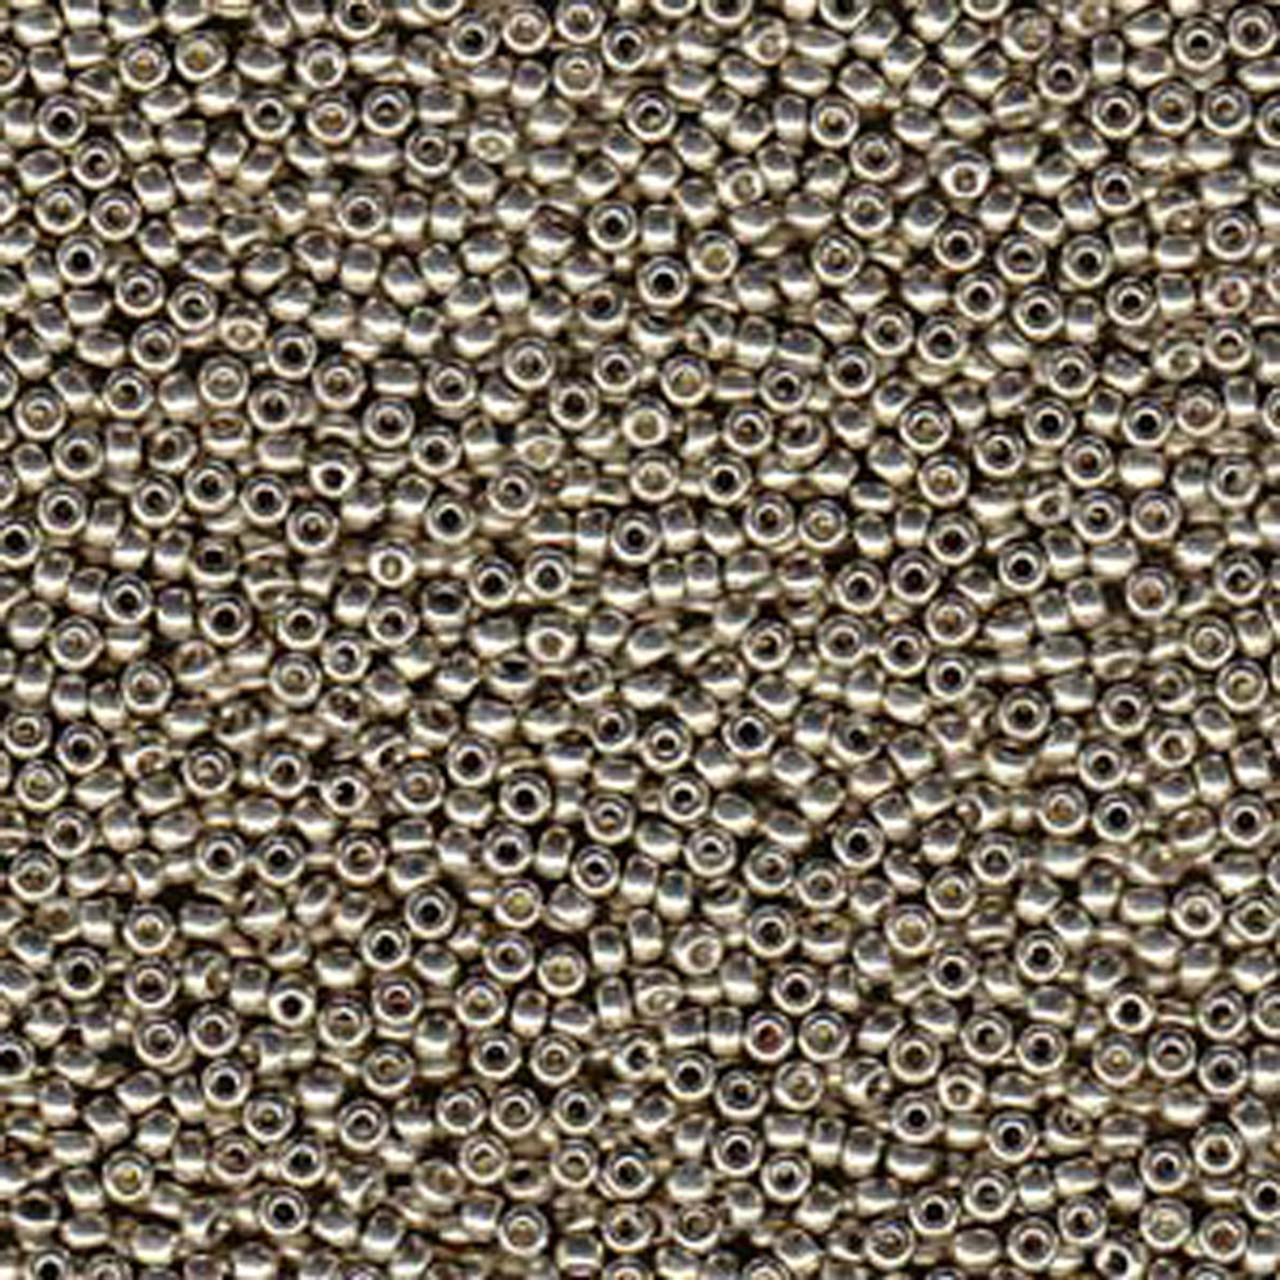 hight resolution of duracoat galvanized light smokey pewter miyuki 11 0 rocailles glass seed beads 24 grams